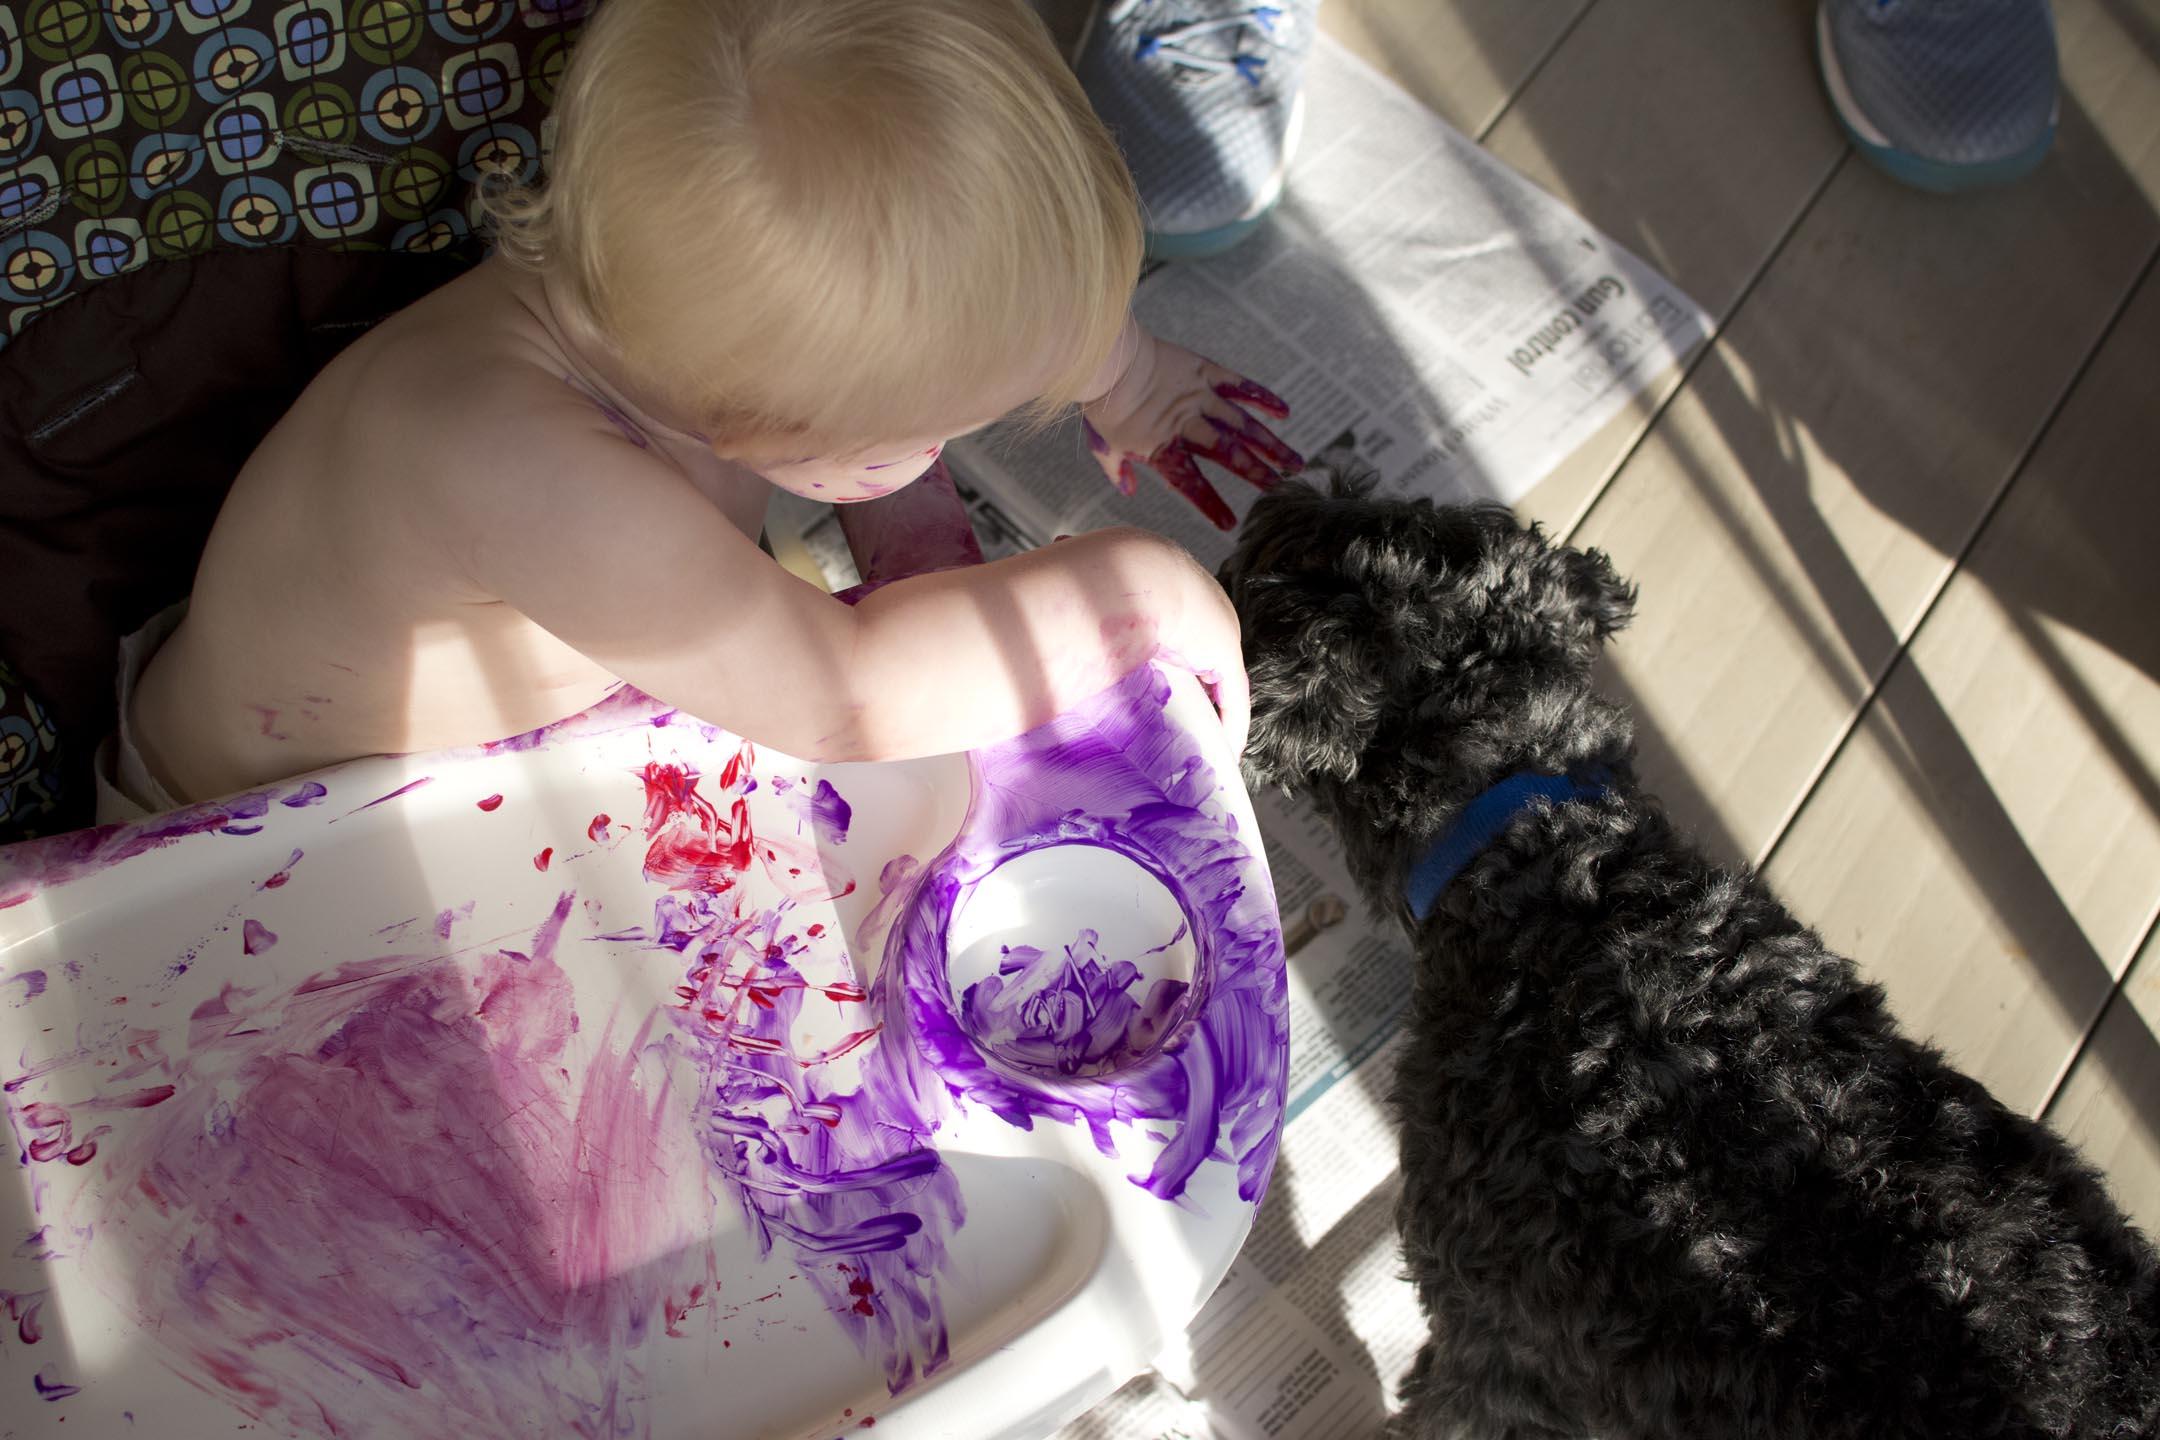 bailey13_painting_lakehouse_10-10-15.jpg